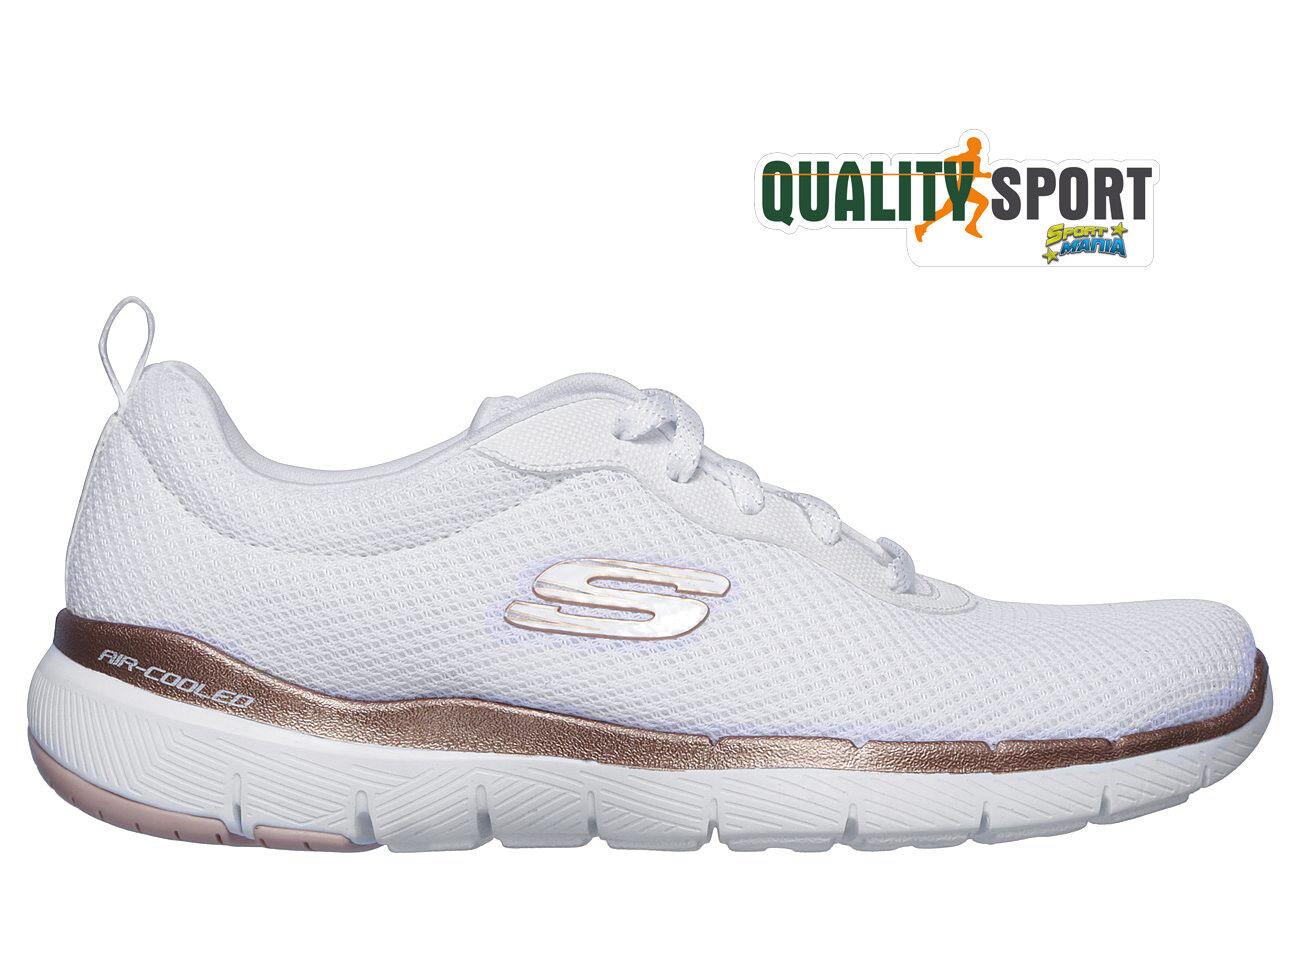 Skechers Skechers Skechers Flex Appeal 3.0 Bianco zapatos mujer Sportive Palestra 13070 WTRG 2019  precio mas barato